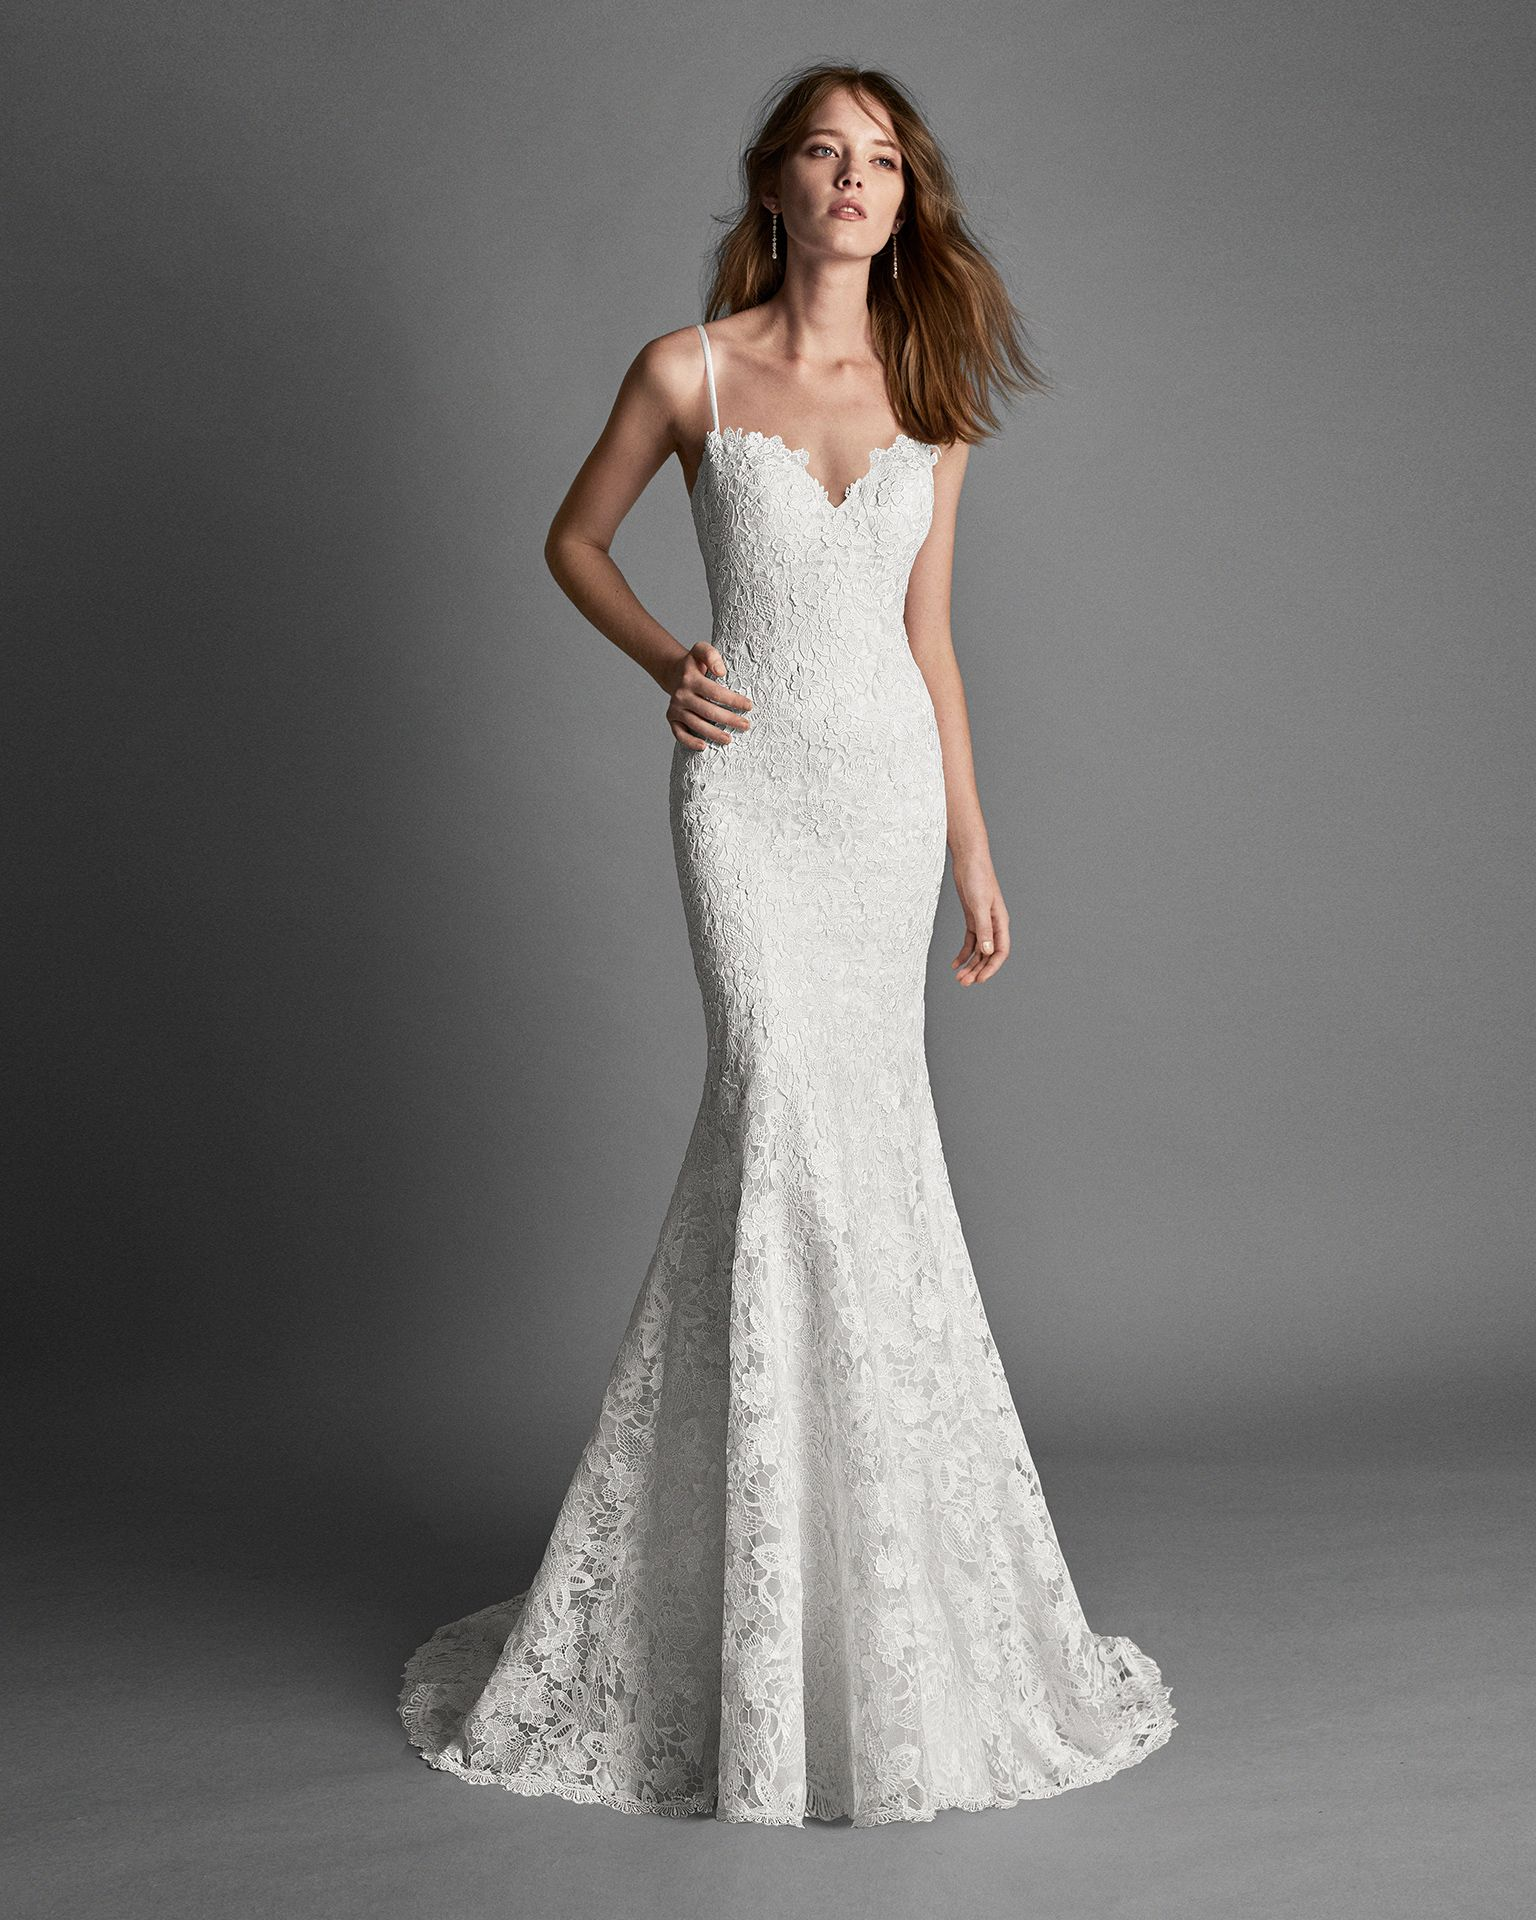 2018 Alma Novia Collection RENIL Mermaid-style guipure lace wedding ...